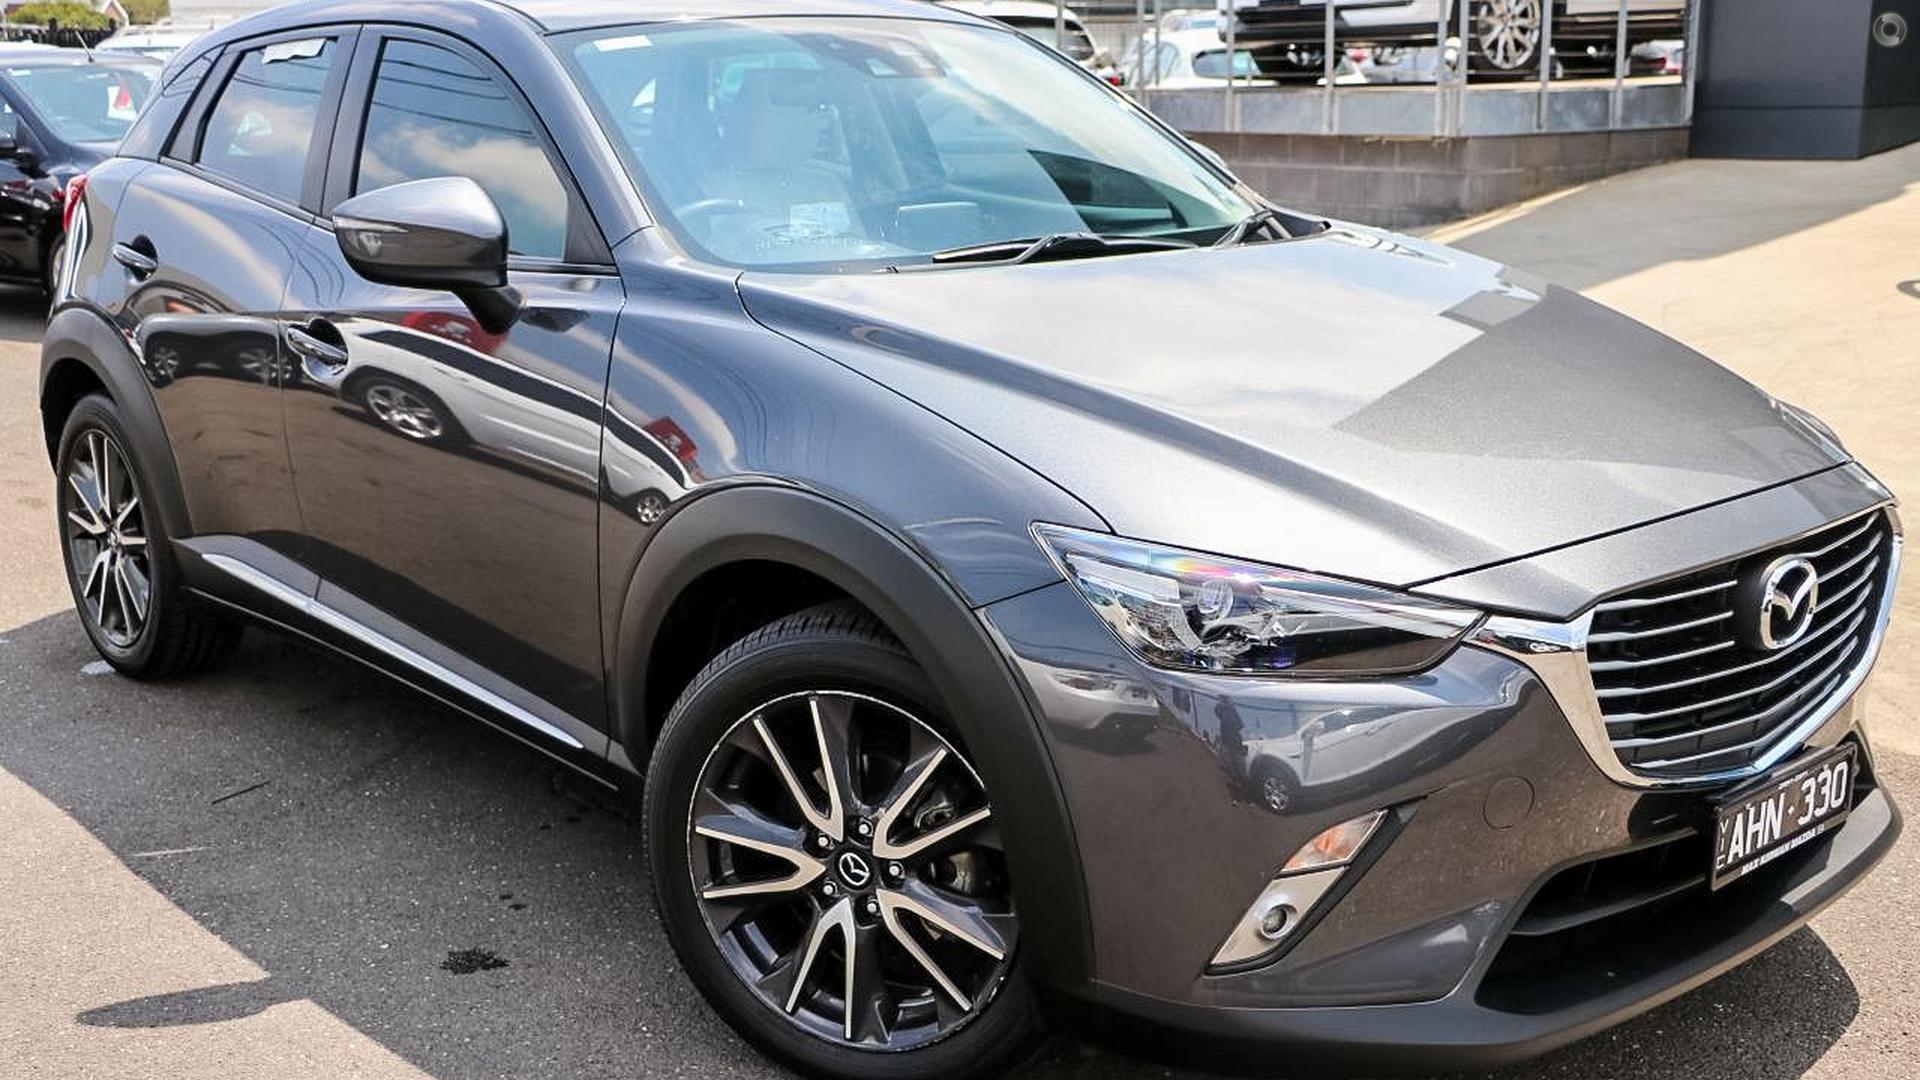 2016 Mazda Cx-3 DK